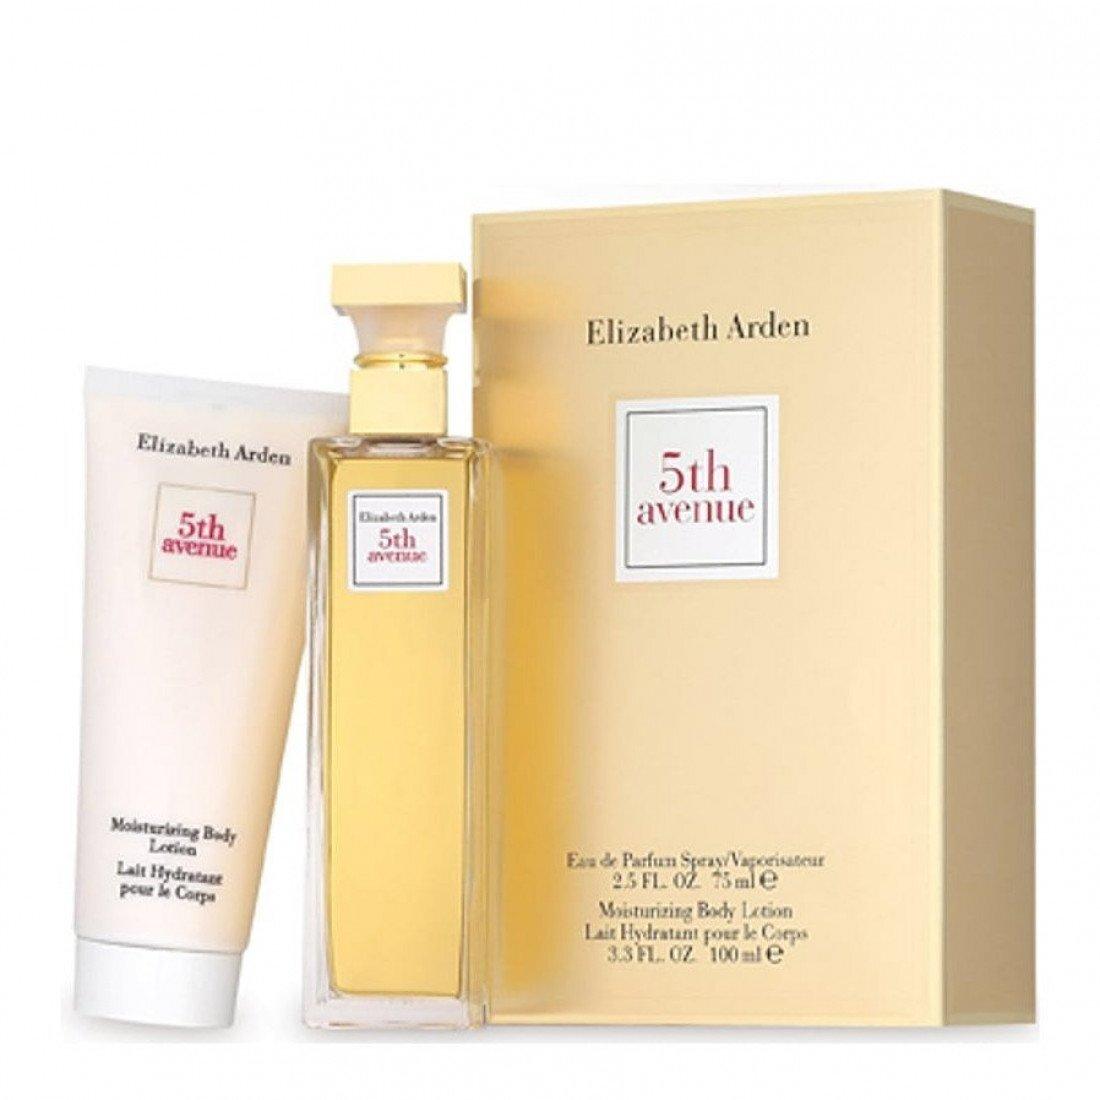 Набор (парфюмерная вода 75 мл + лосьон для тела 100 мл) Elizabeth Arden 5th Avenue